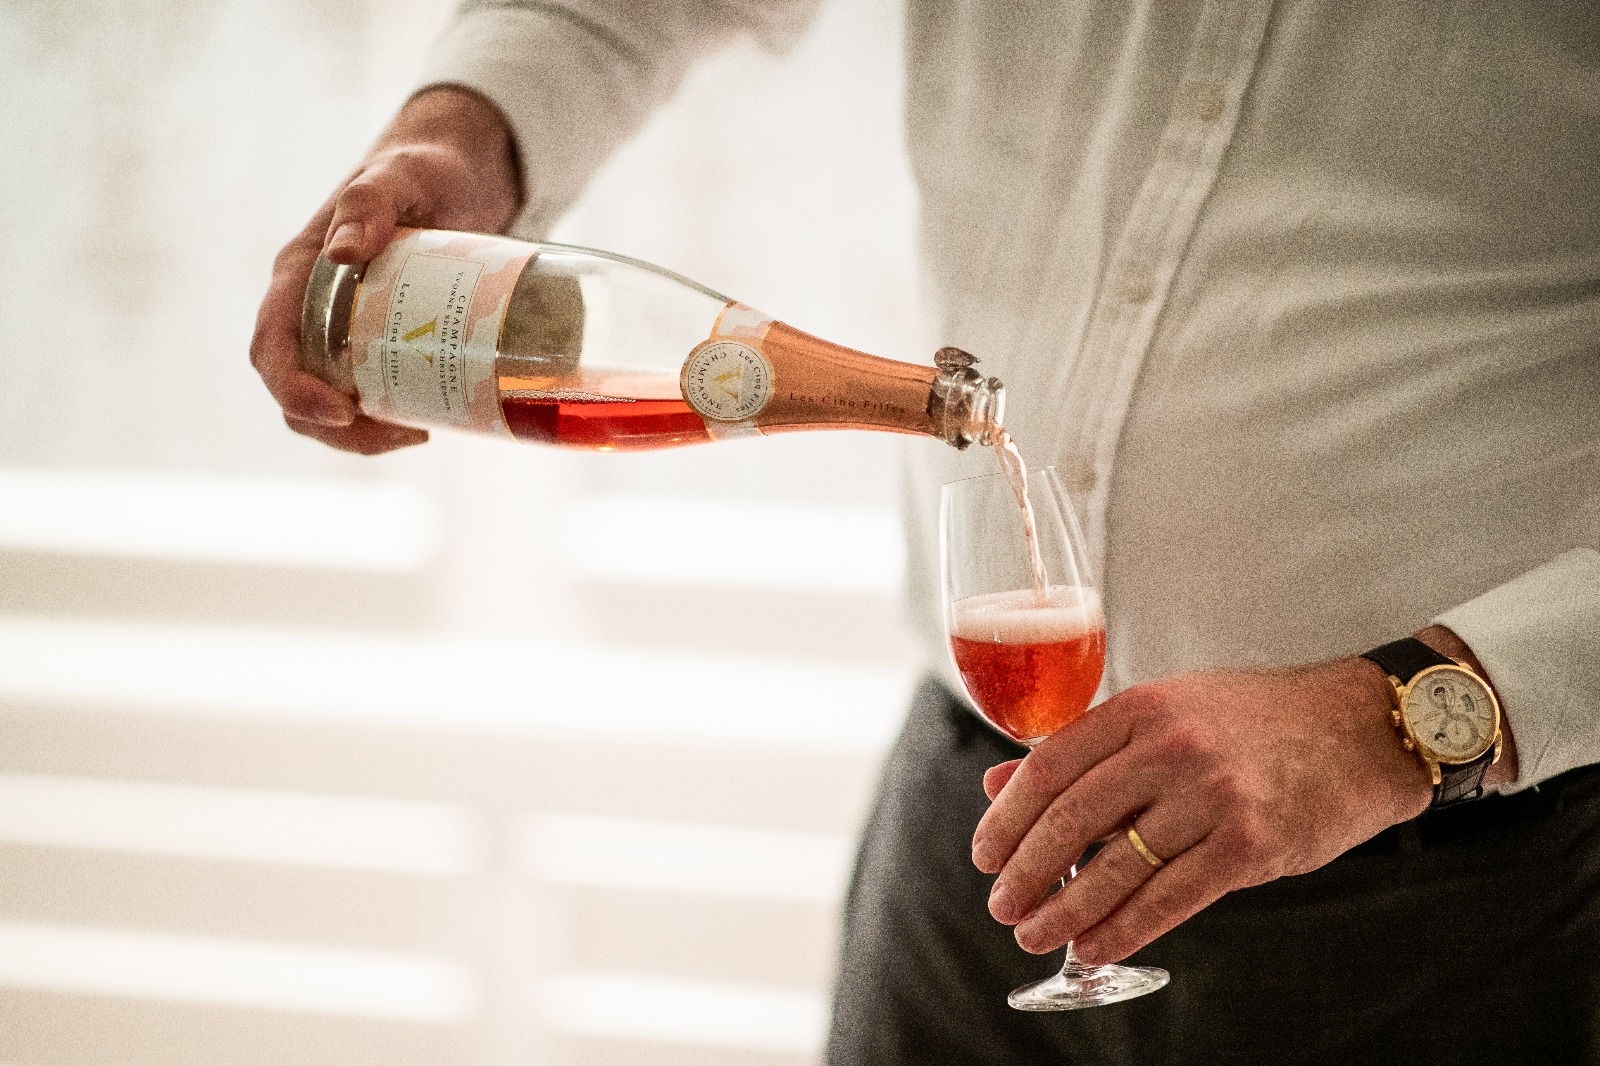 Rose Champagne Les Cinq Filles Champagne , Biodynamic 3g/L